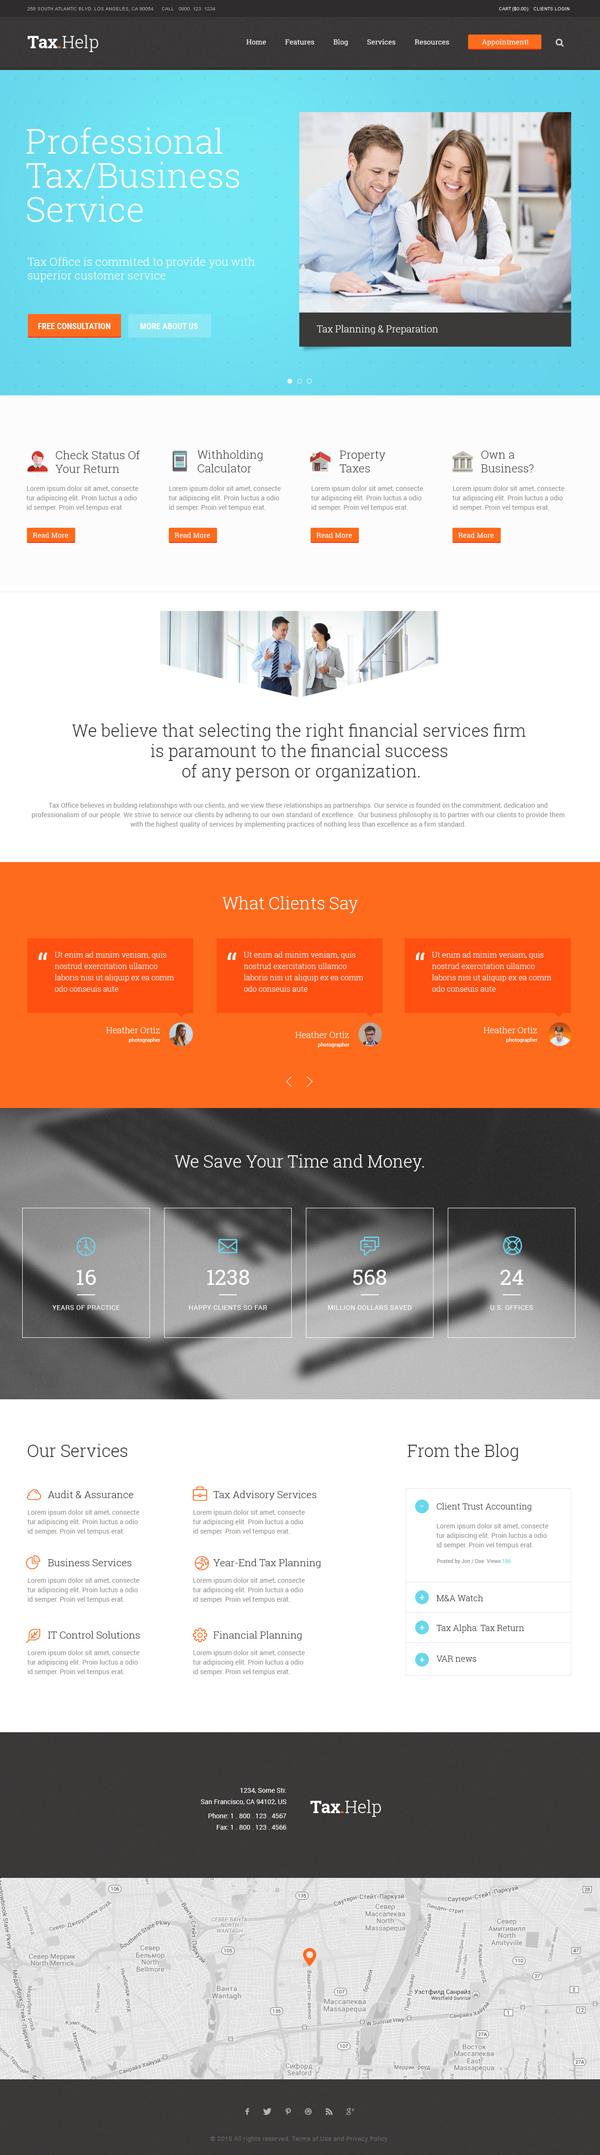 Tax Help - Finance & Accounting WordPress Theme